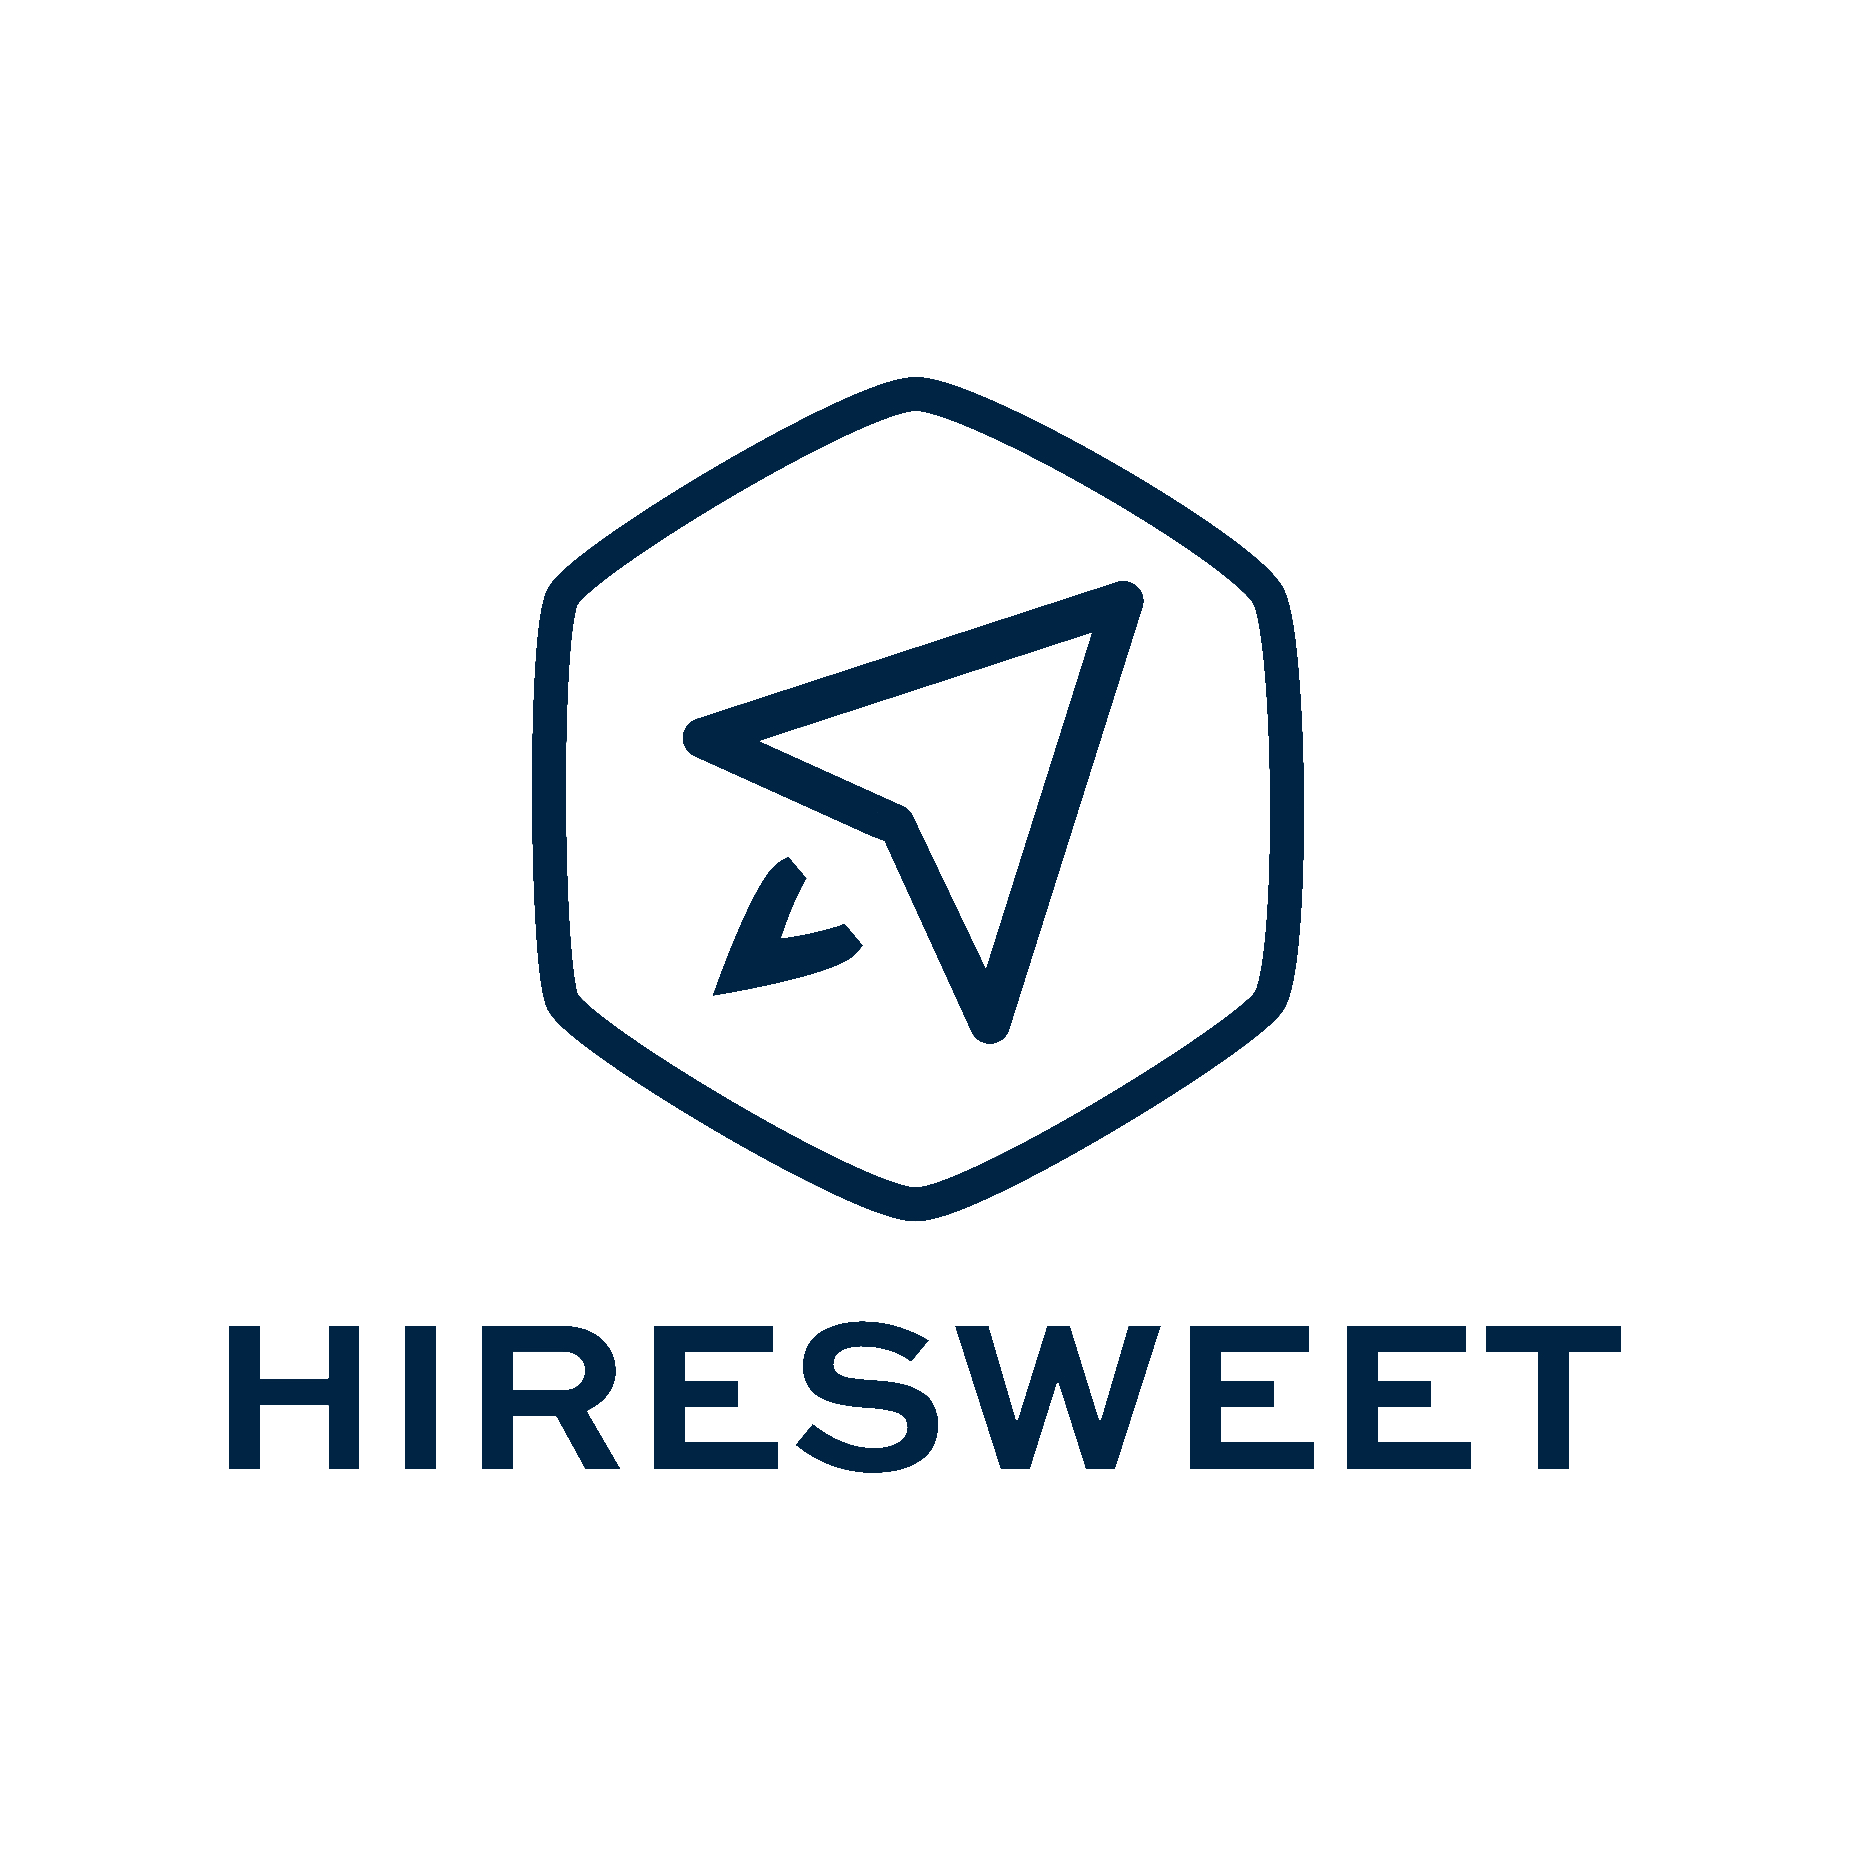 HireSweet